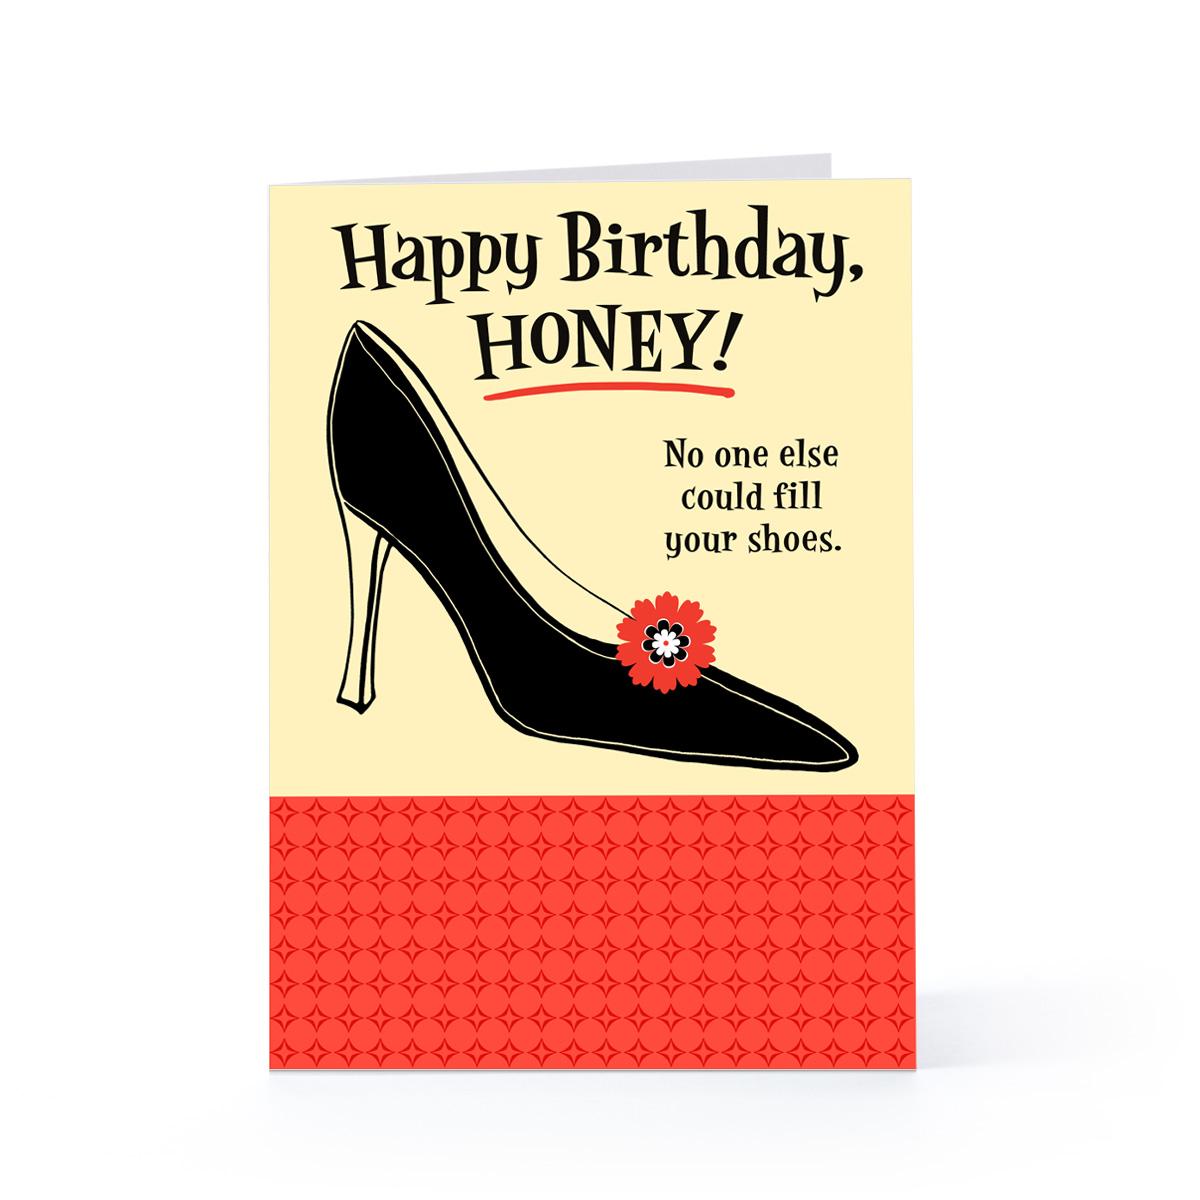 happy birthday david funny